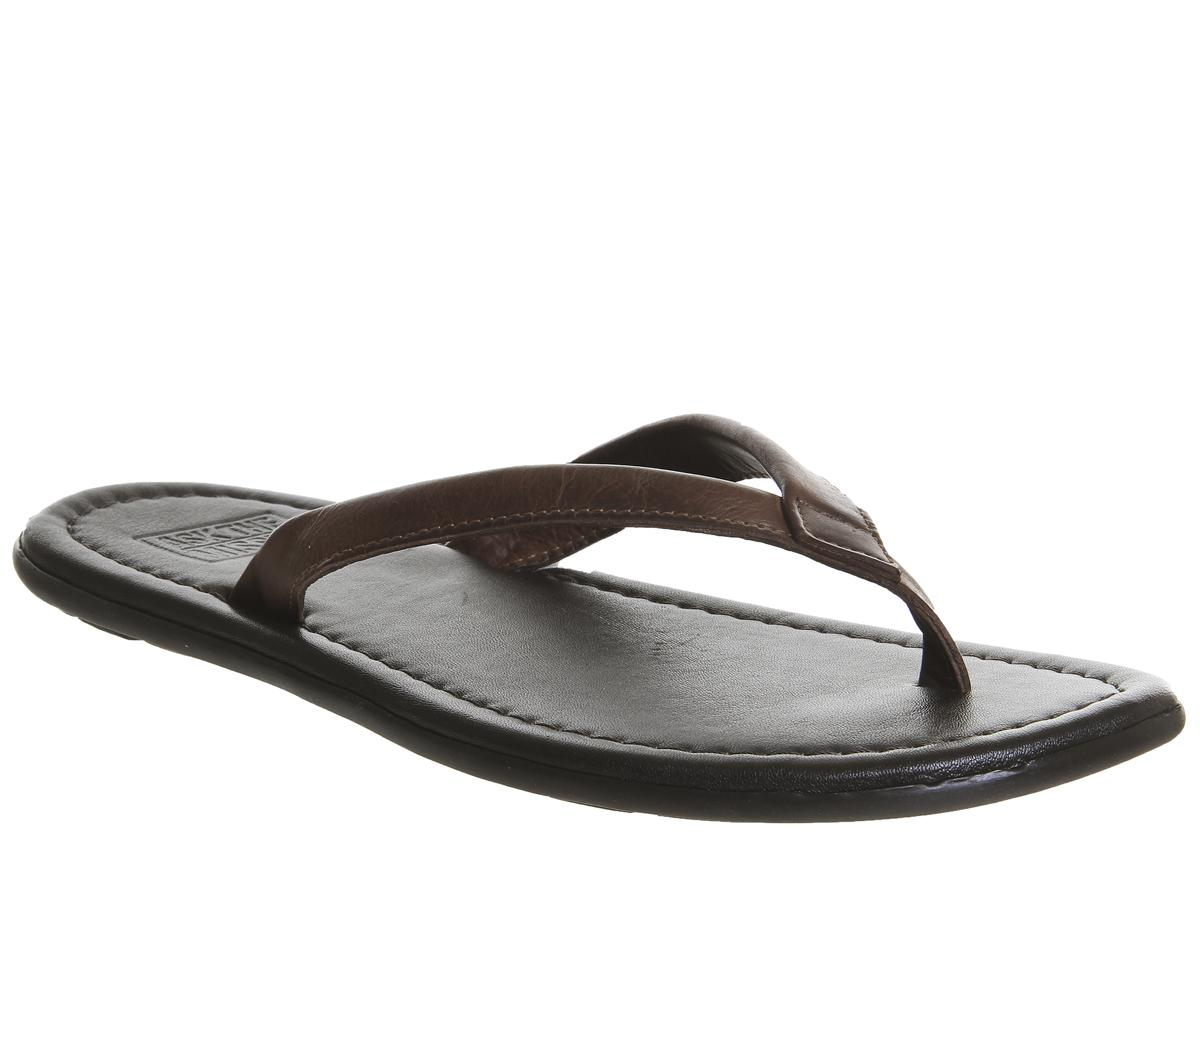 Frank Thong Sandals